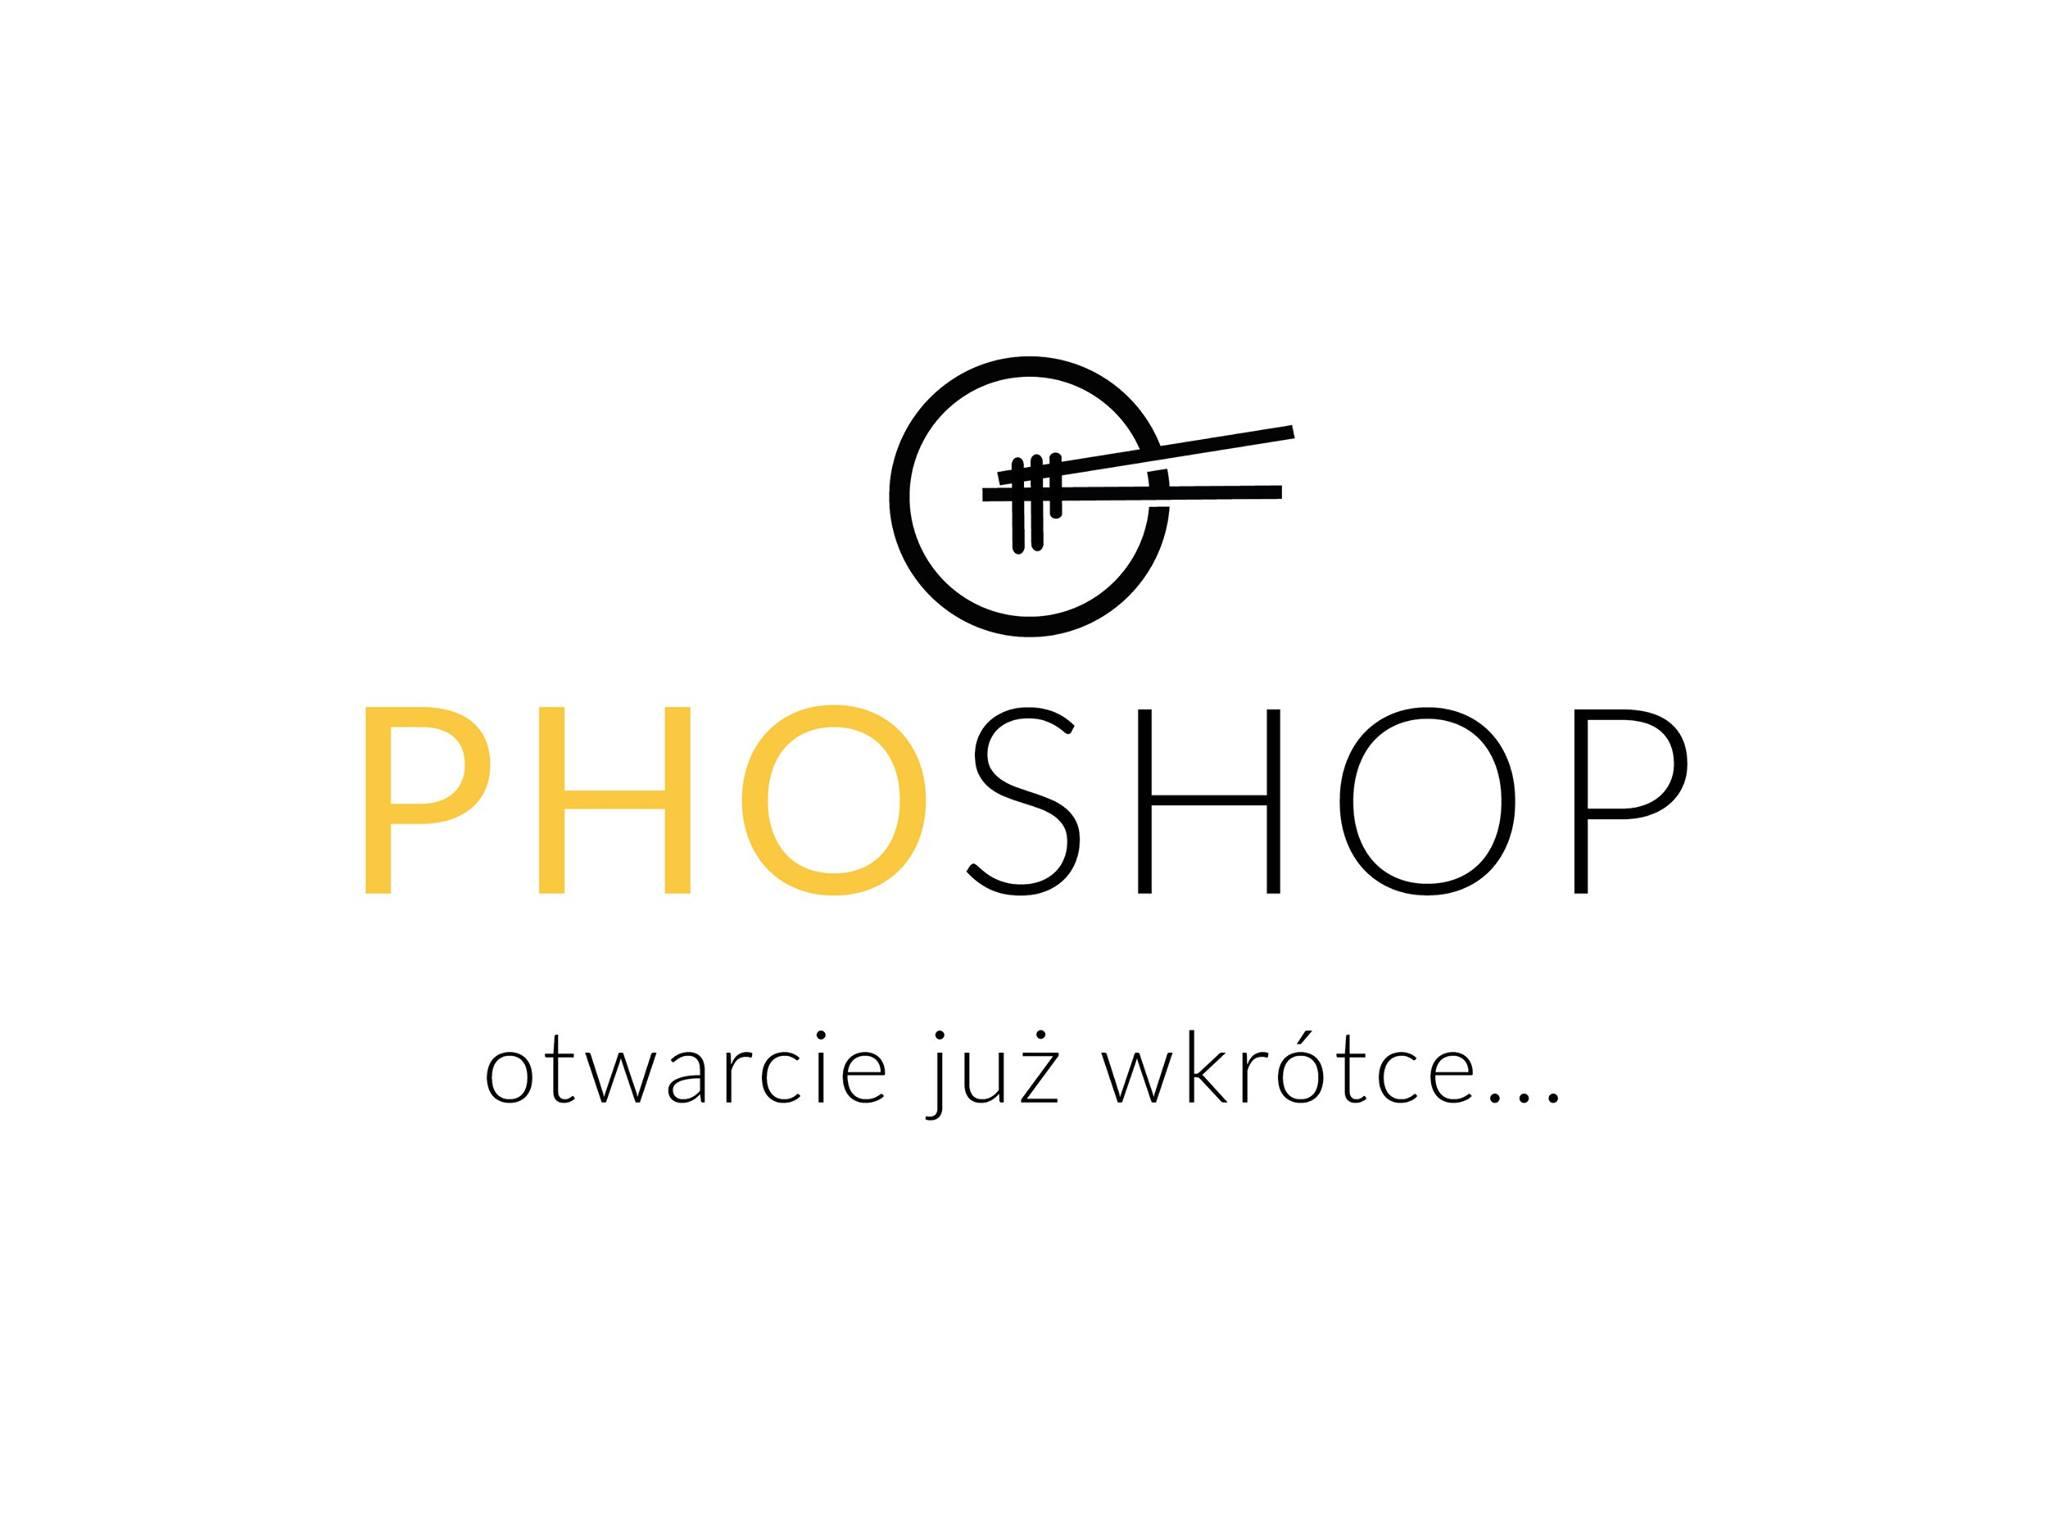 Pho Shop